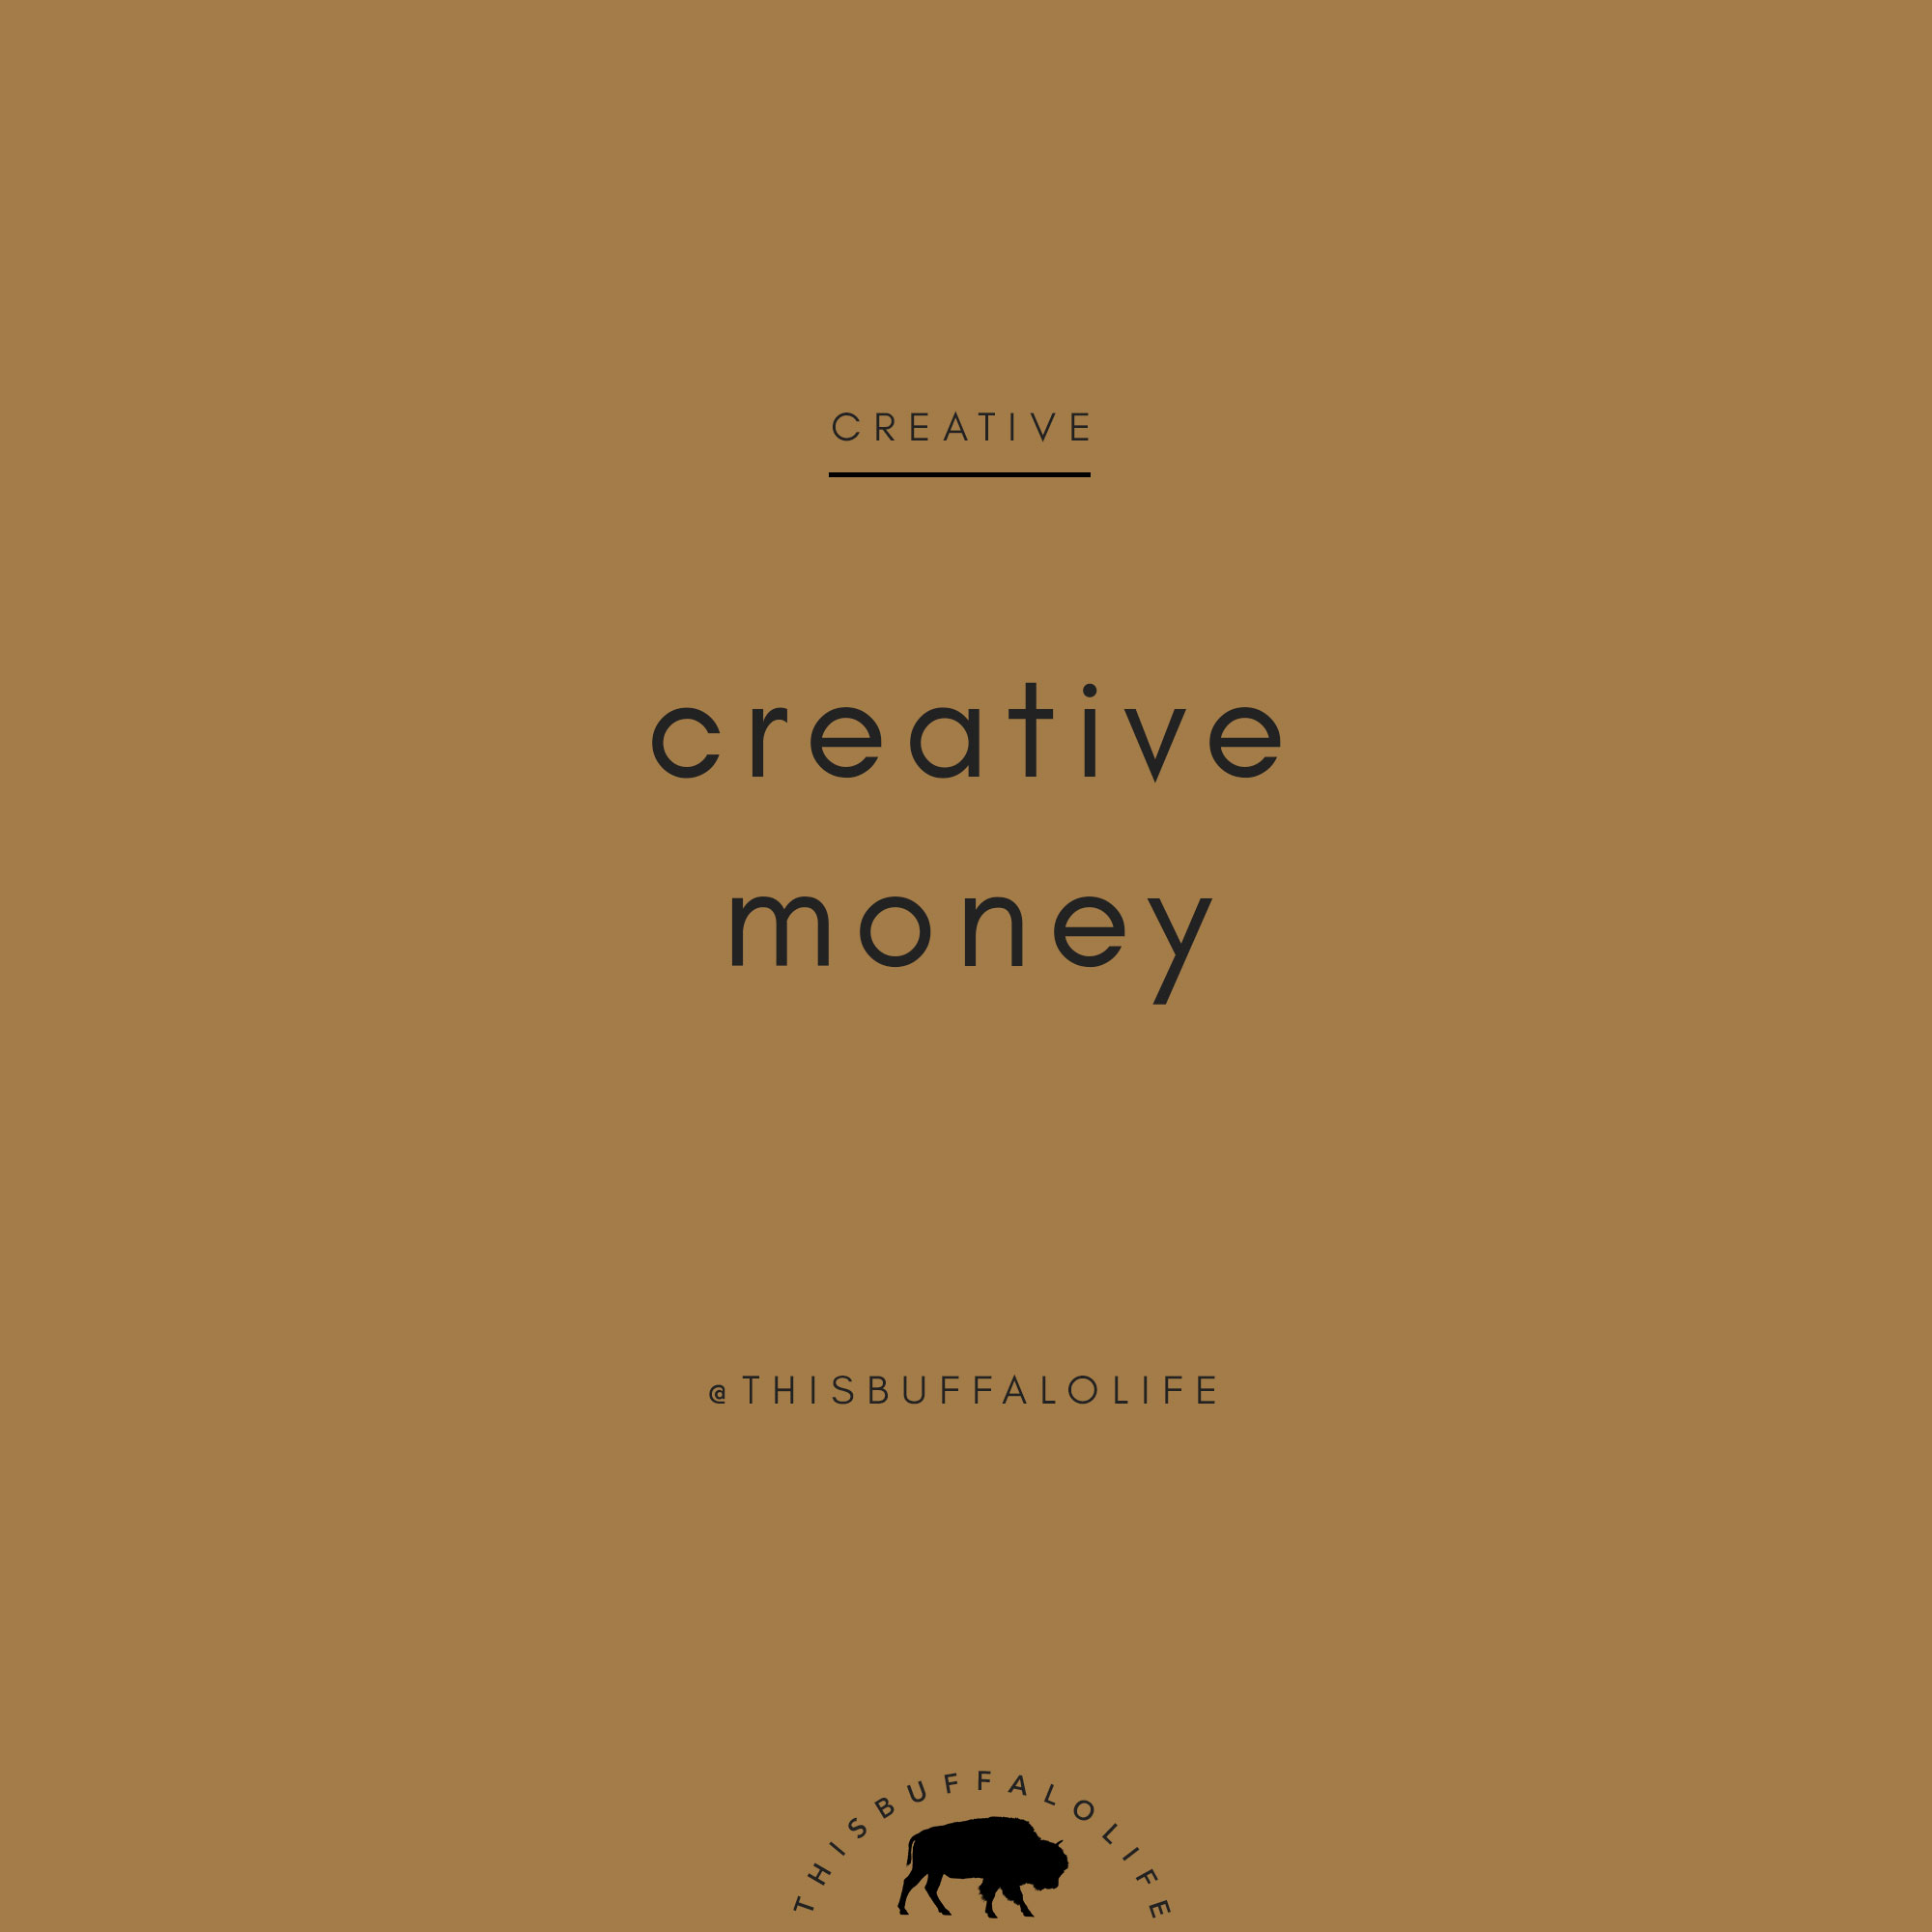 creative-money.jpg